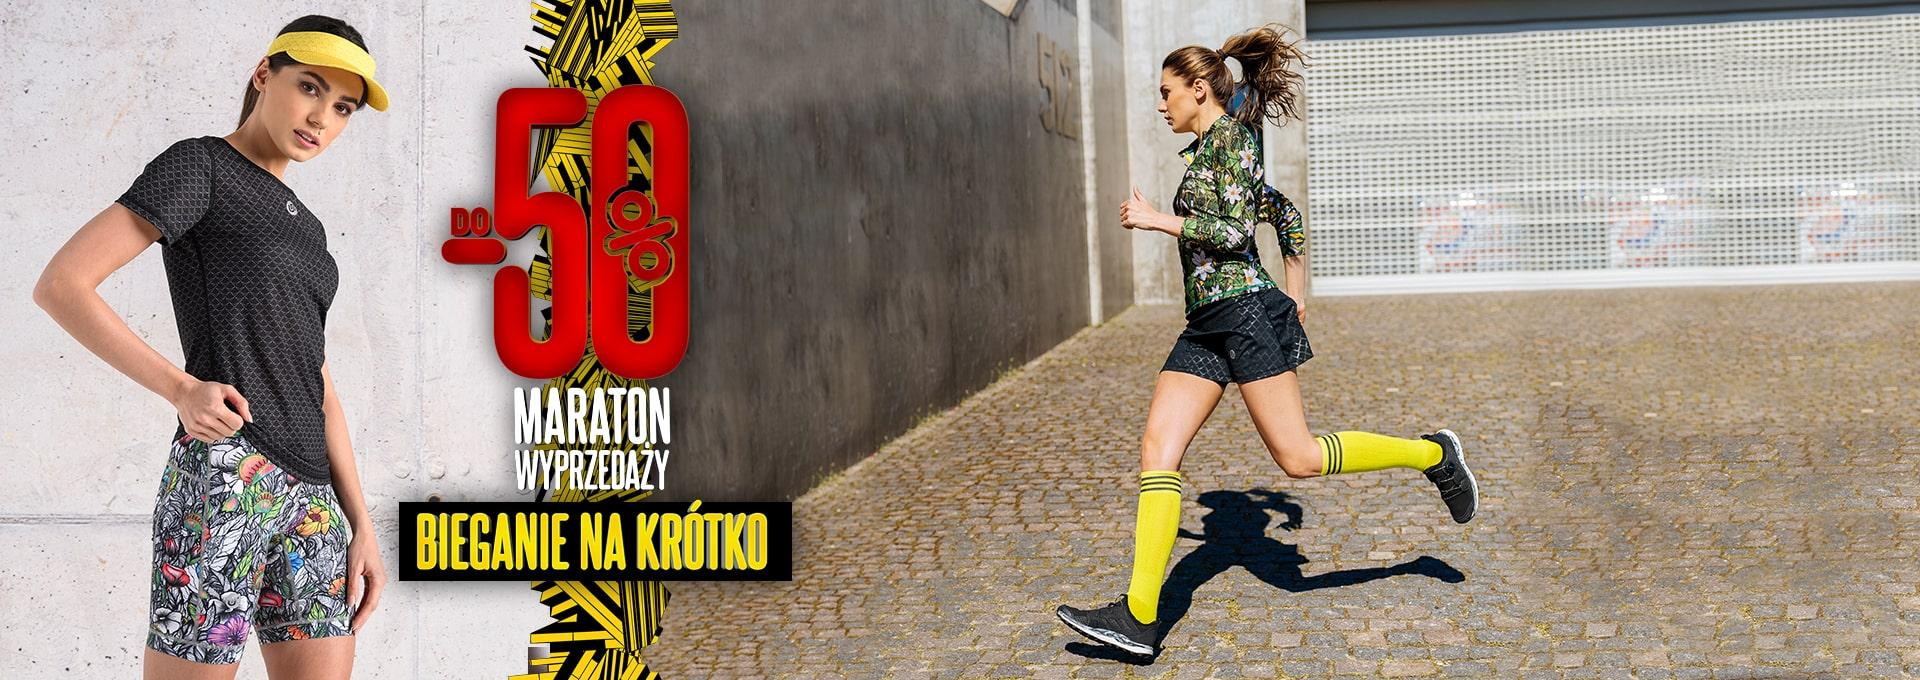 Maraton na krótko